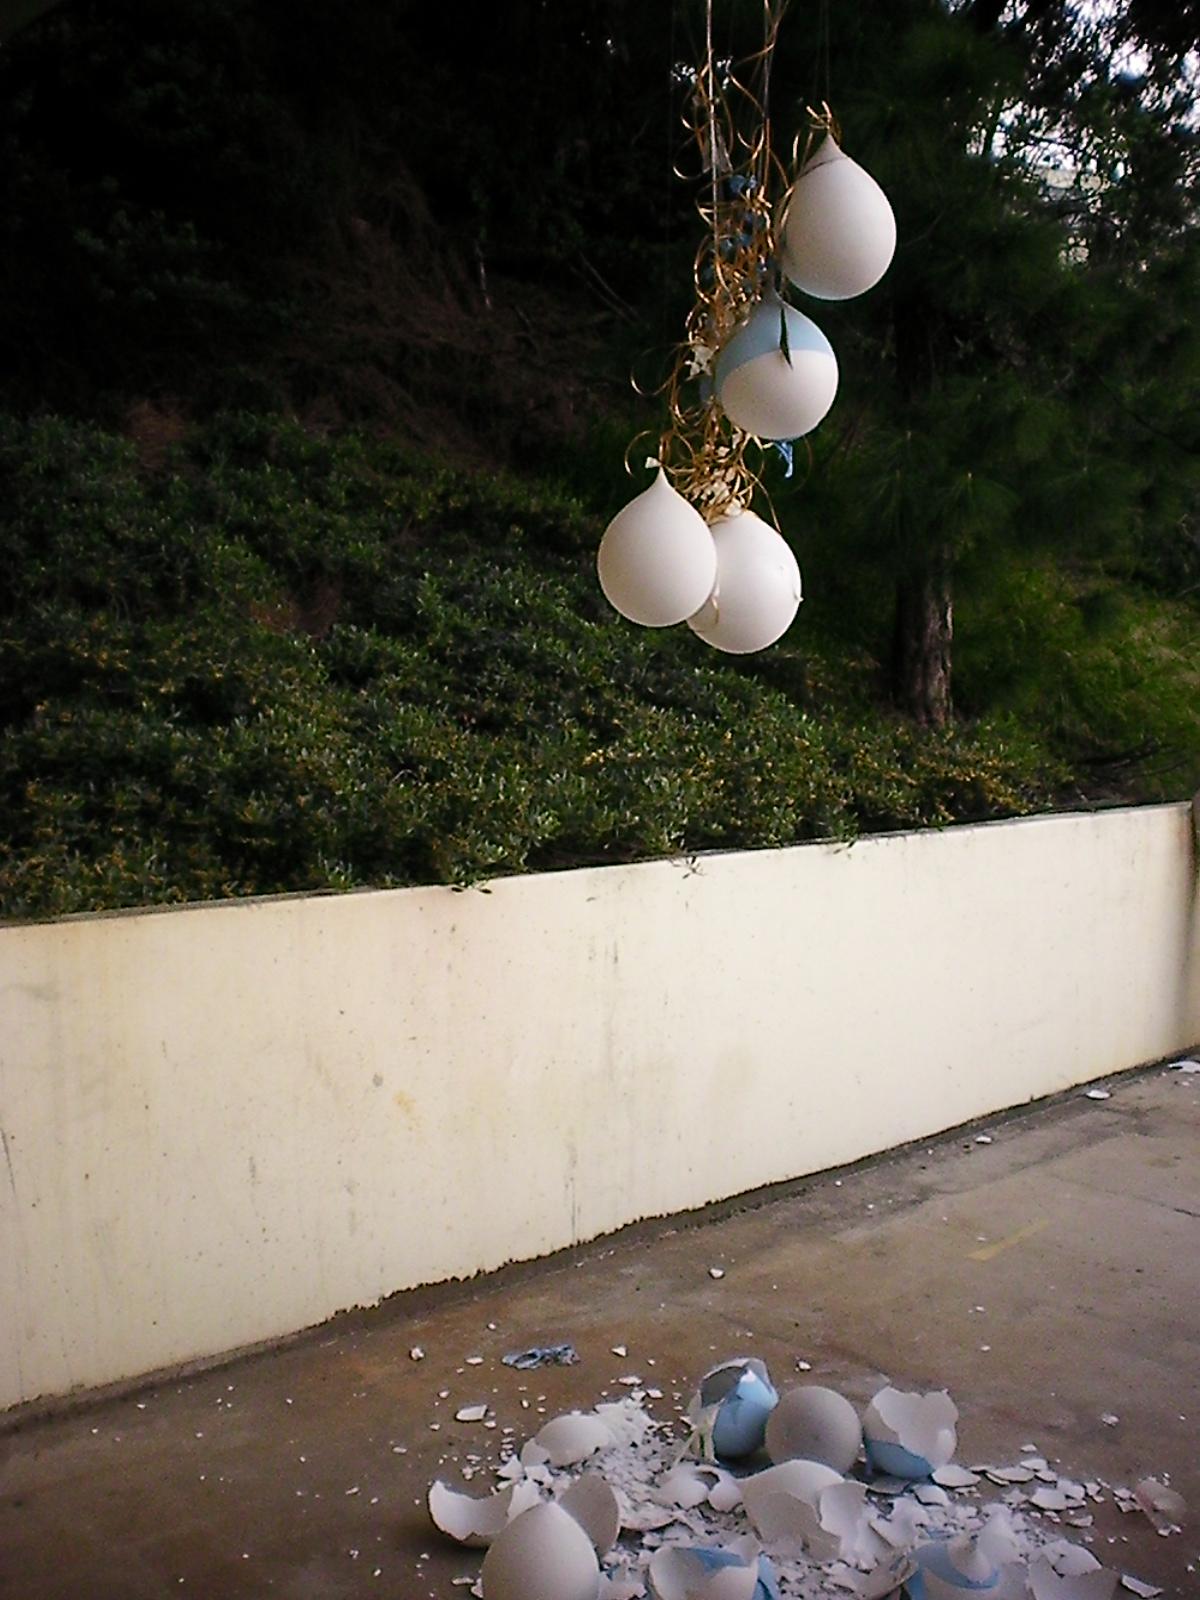 Biliousness, 2011   6' x 5' x 12'  Plaster, Balloons, Mono-filament, Mirror